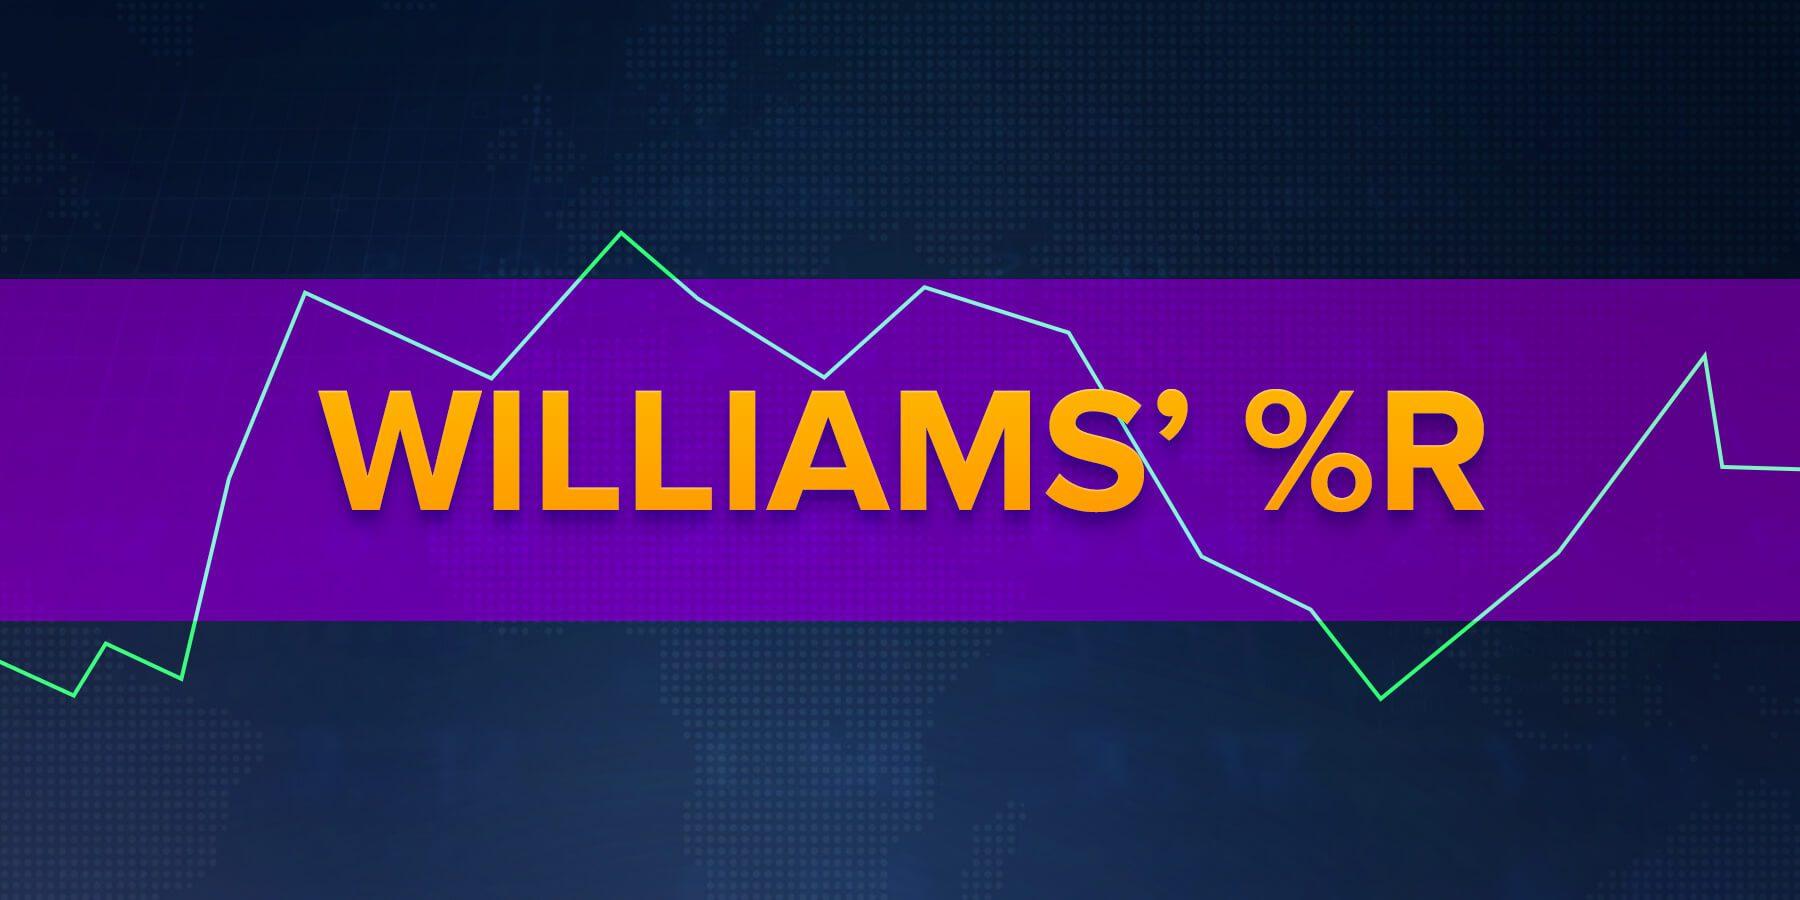 chỉ-số-williams-percent-range